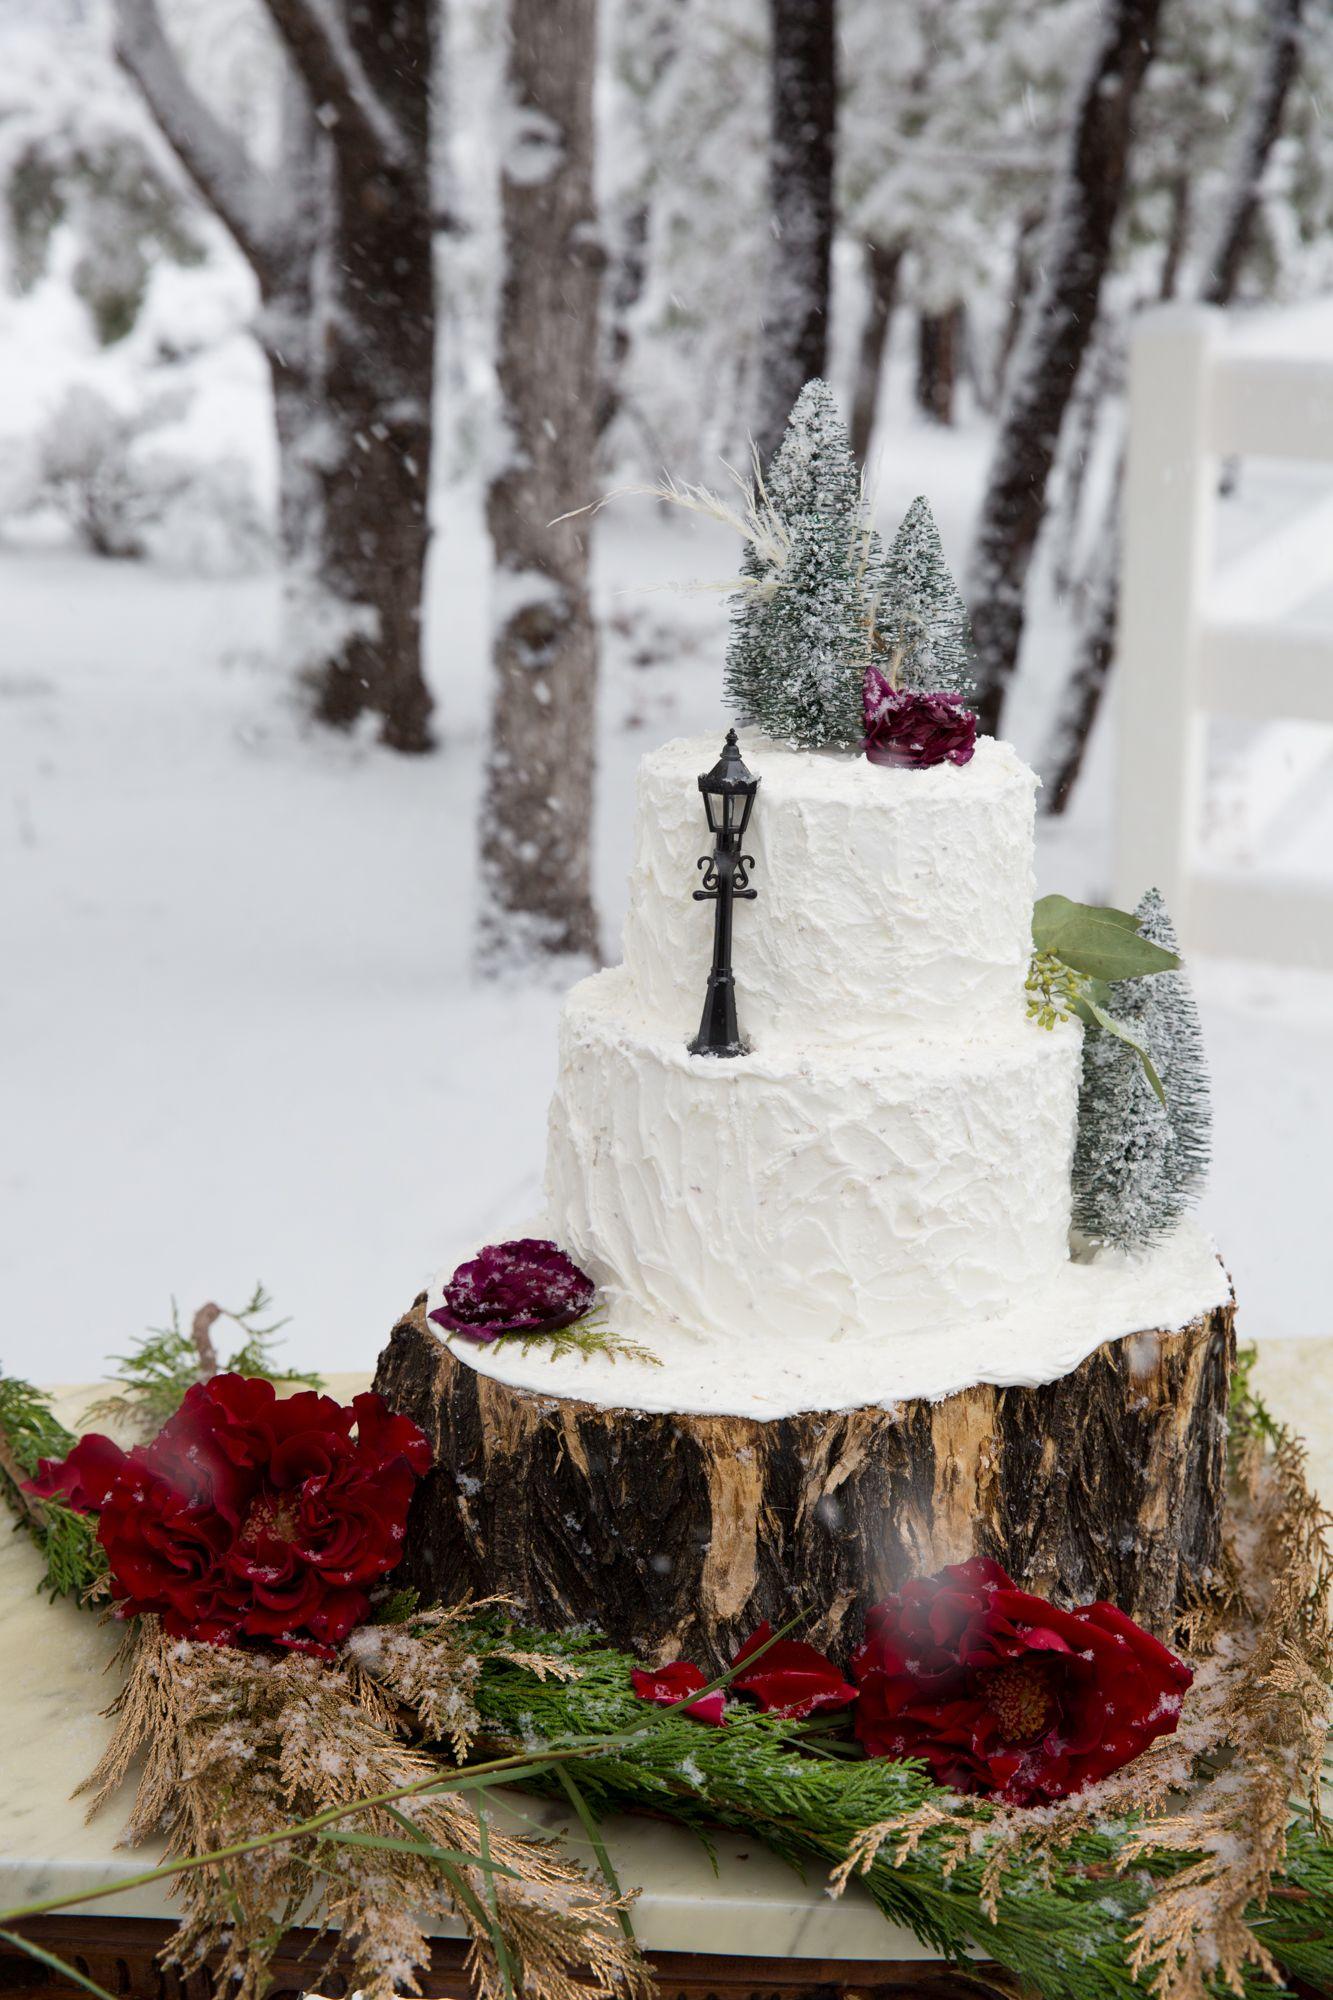 Winter wedding Cake | Wedding Cakes | Pinterest | Winter weddings ...